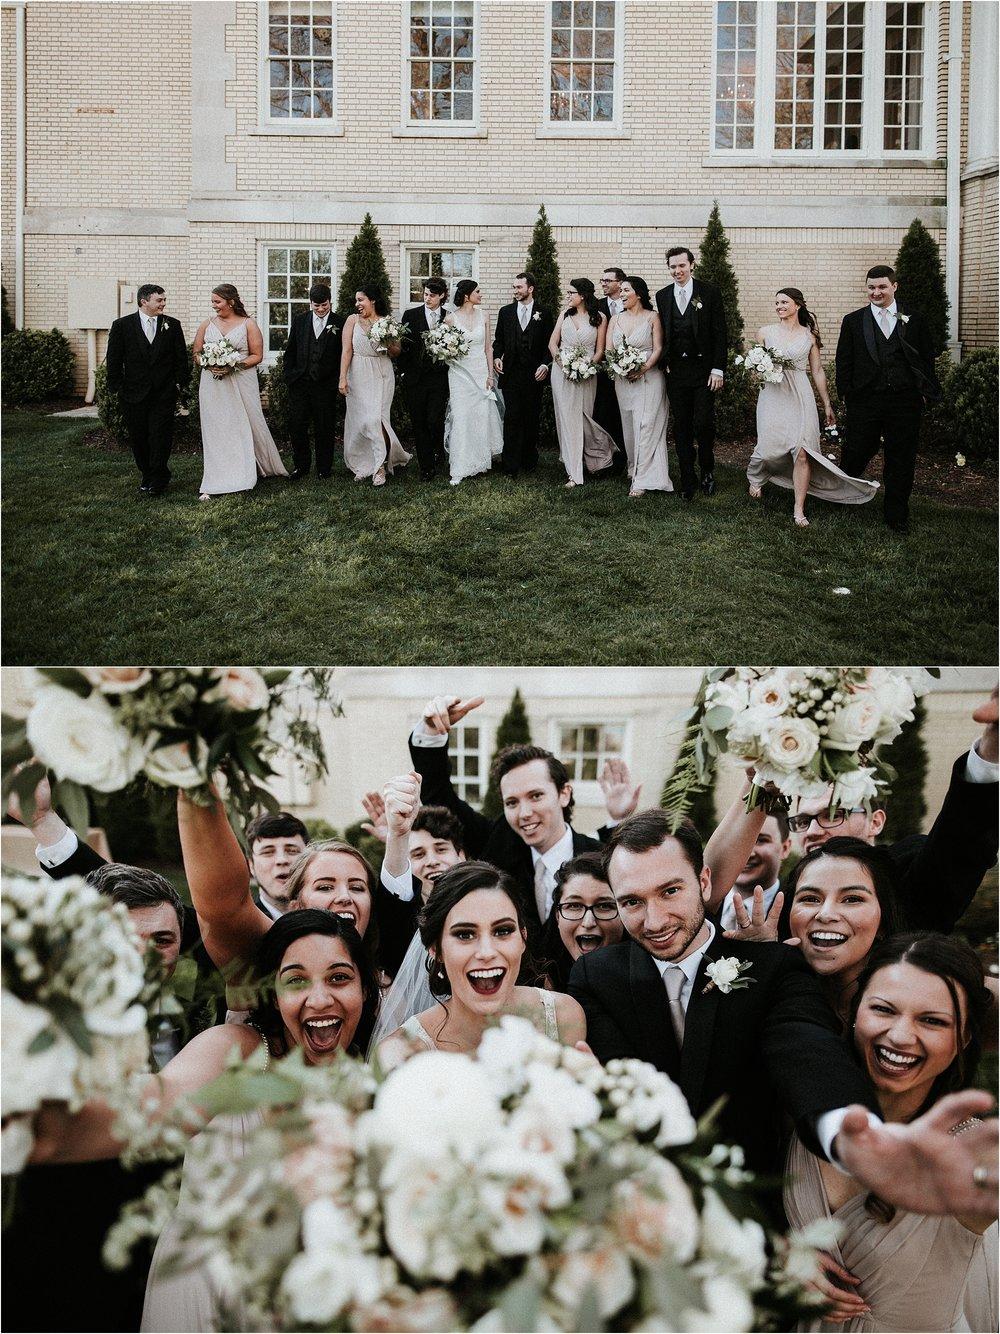 separk-mansion-gastonia-nc-wedding-photographer491.jpg